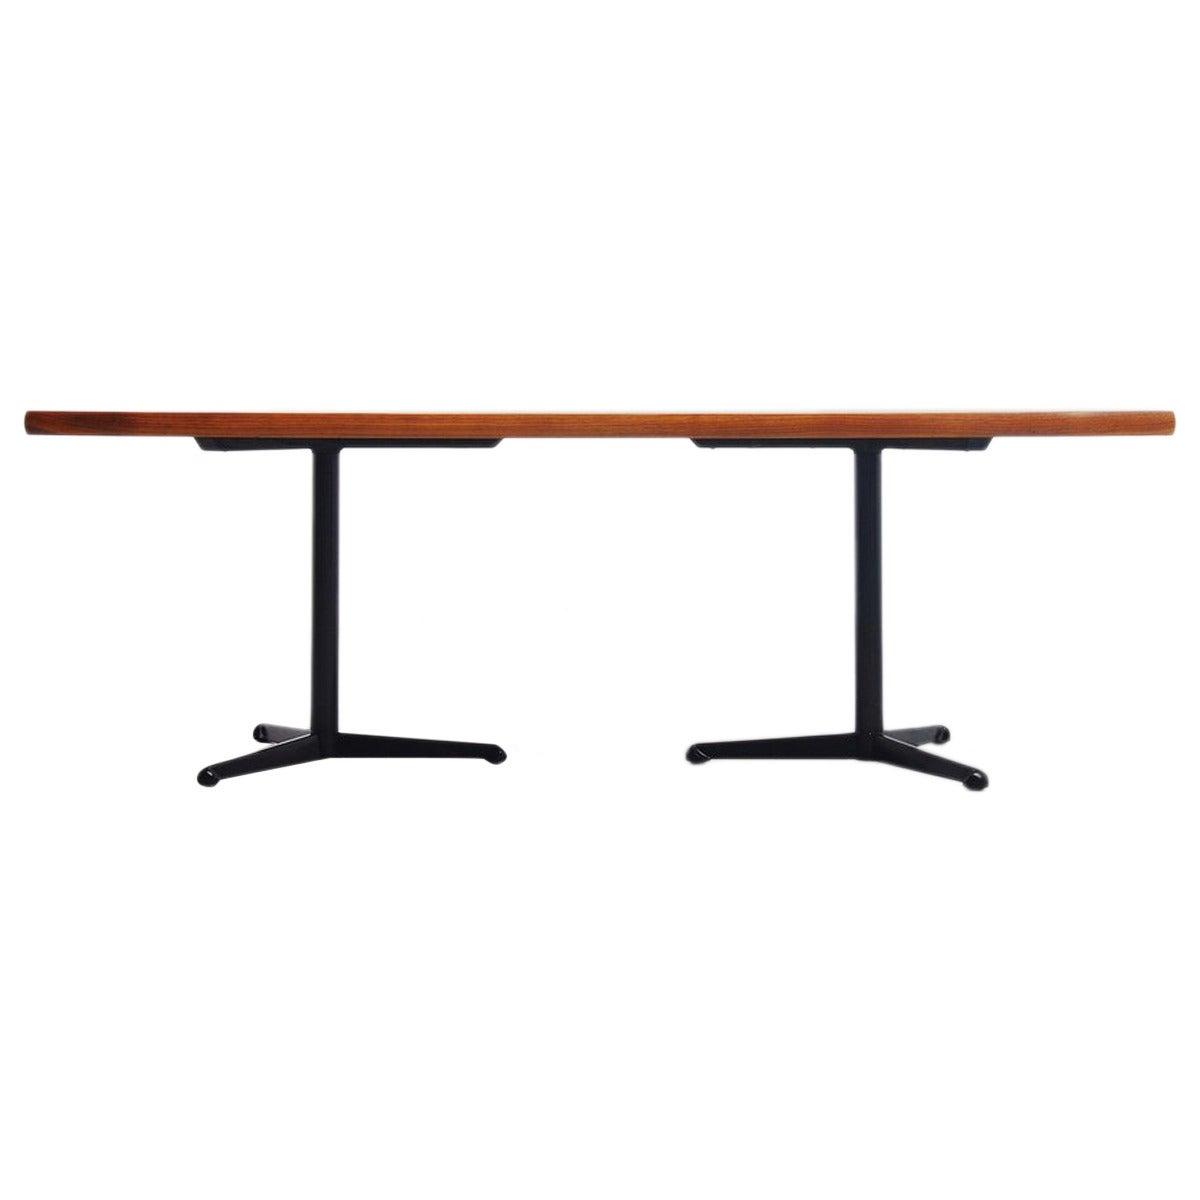 Osvaldo Borsani conference table / desk Tecno Italy 1954